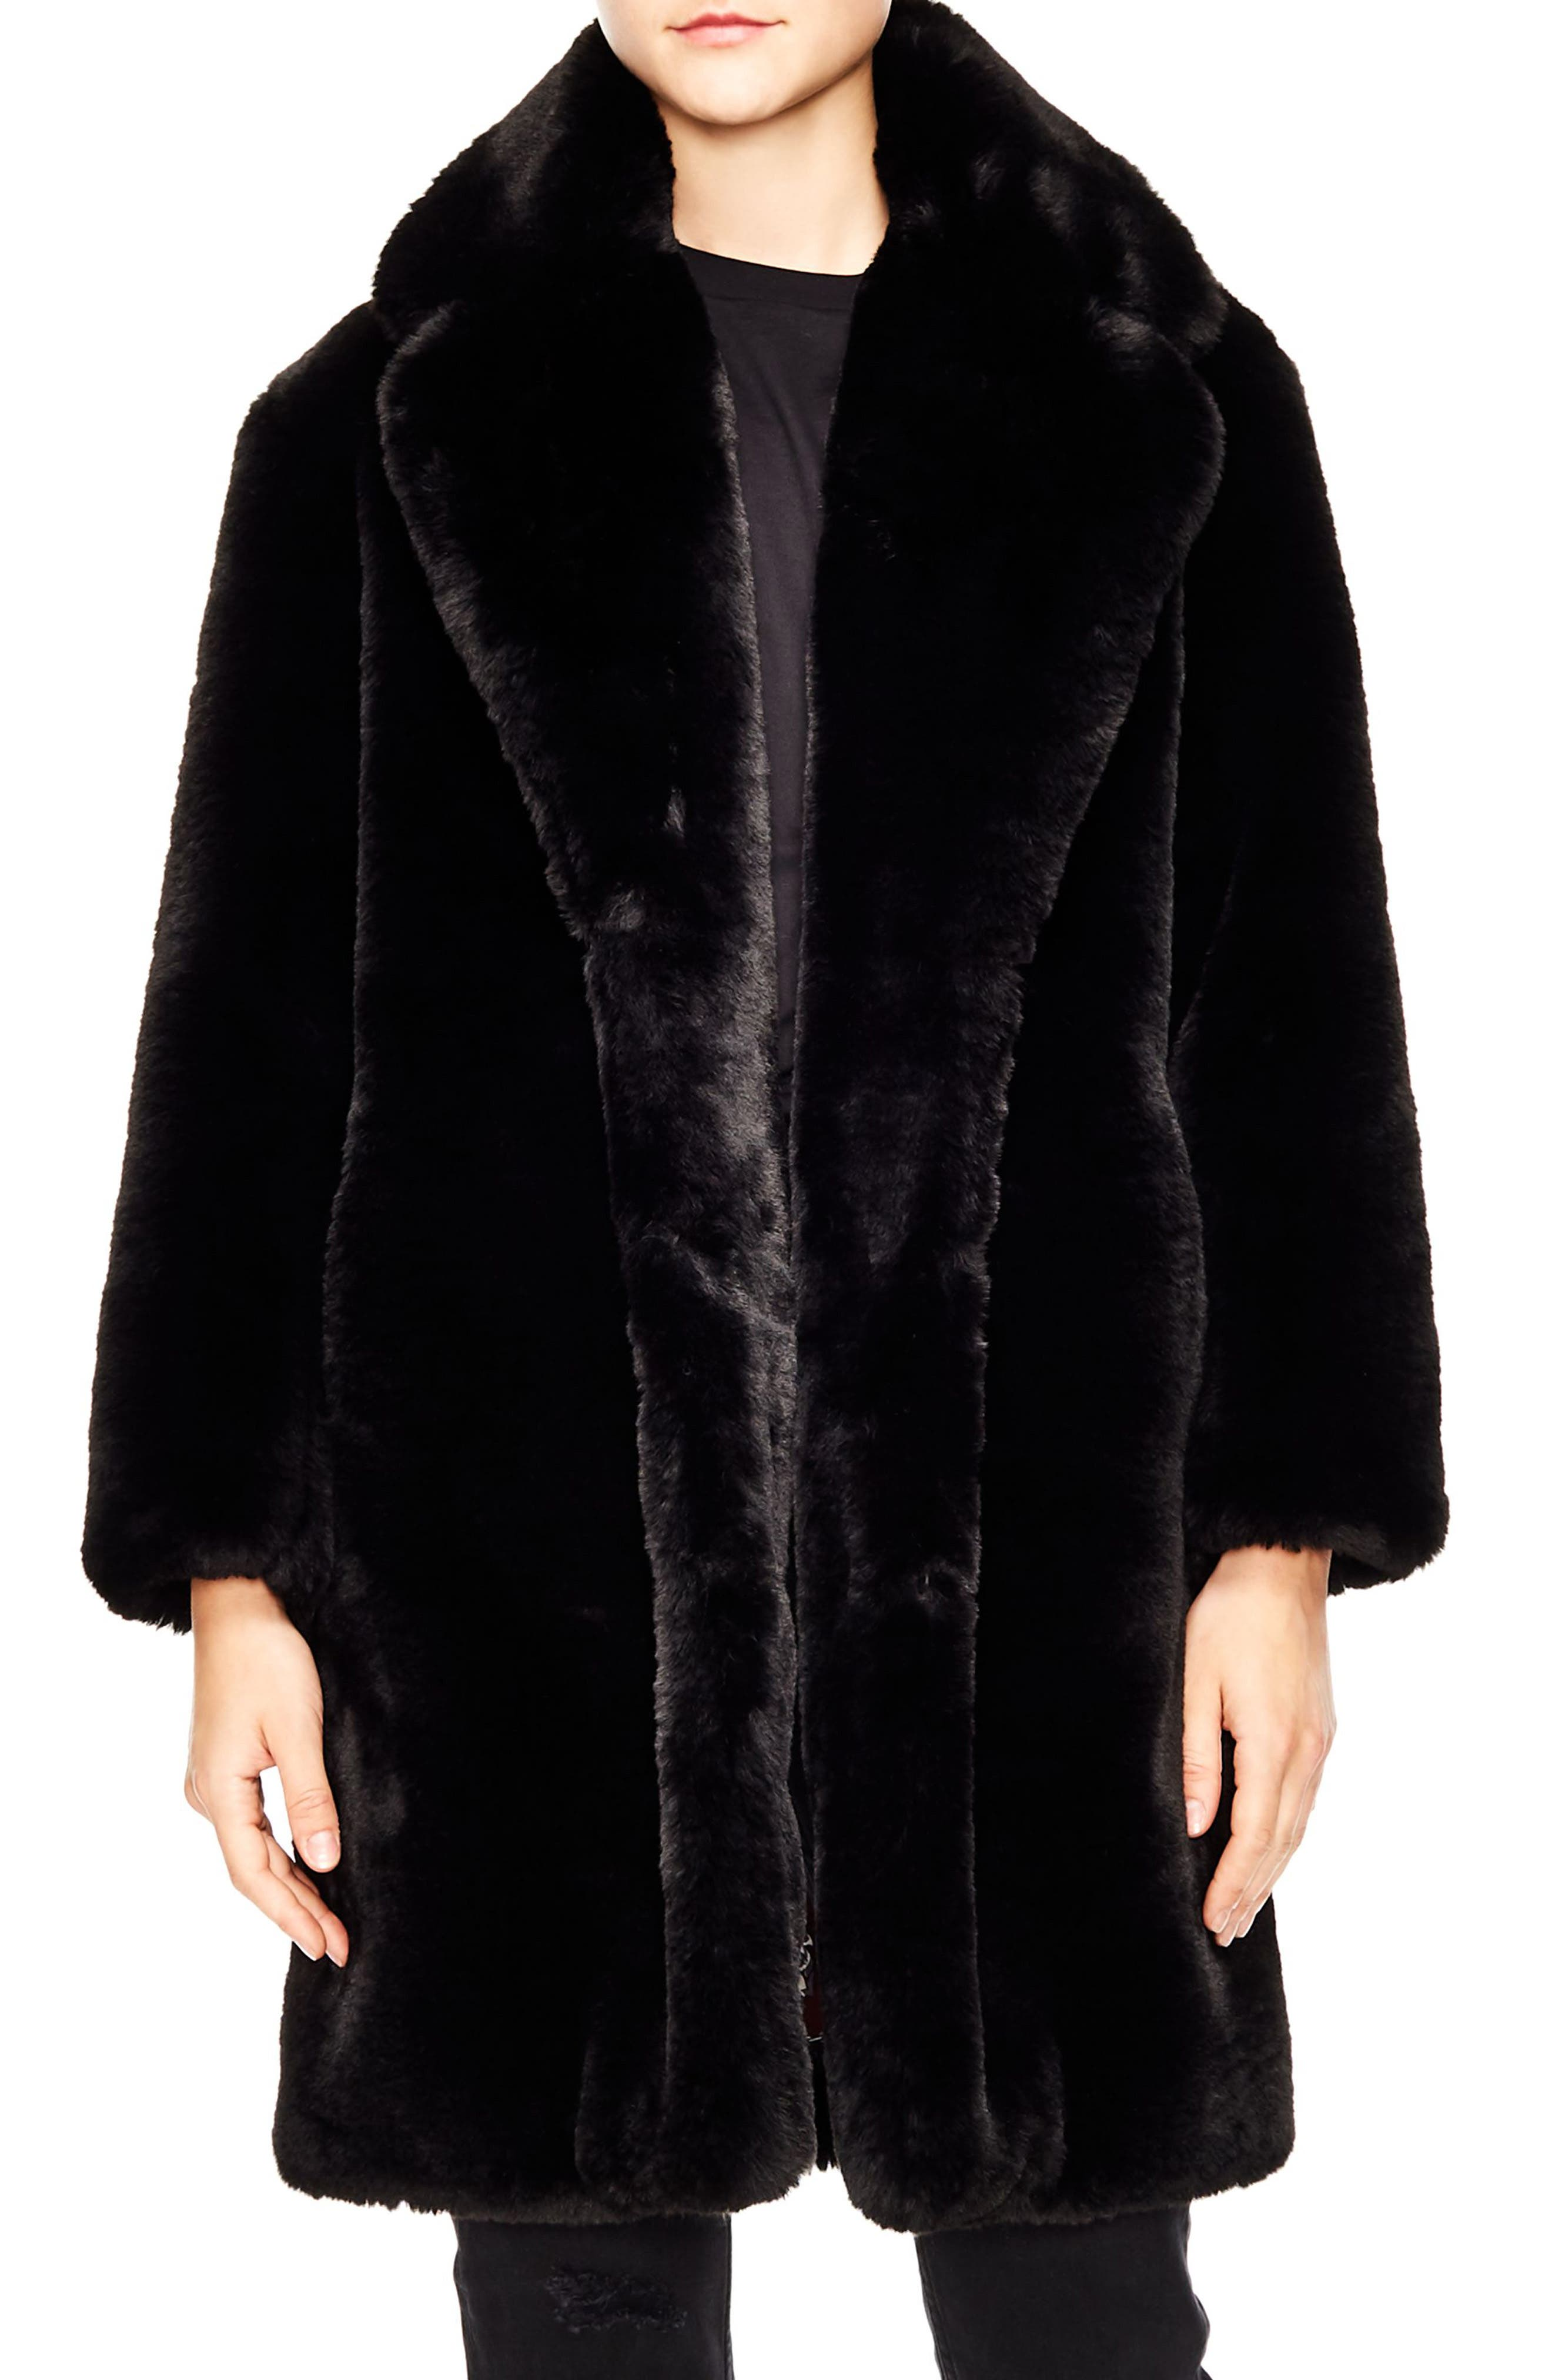 Ballote Oversized Faux Fur Coat in Black